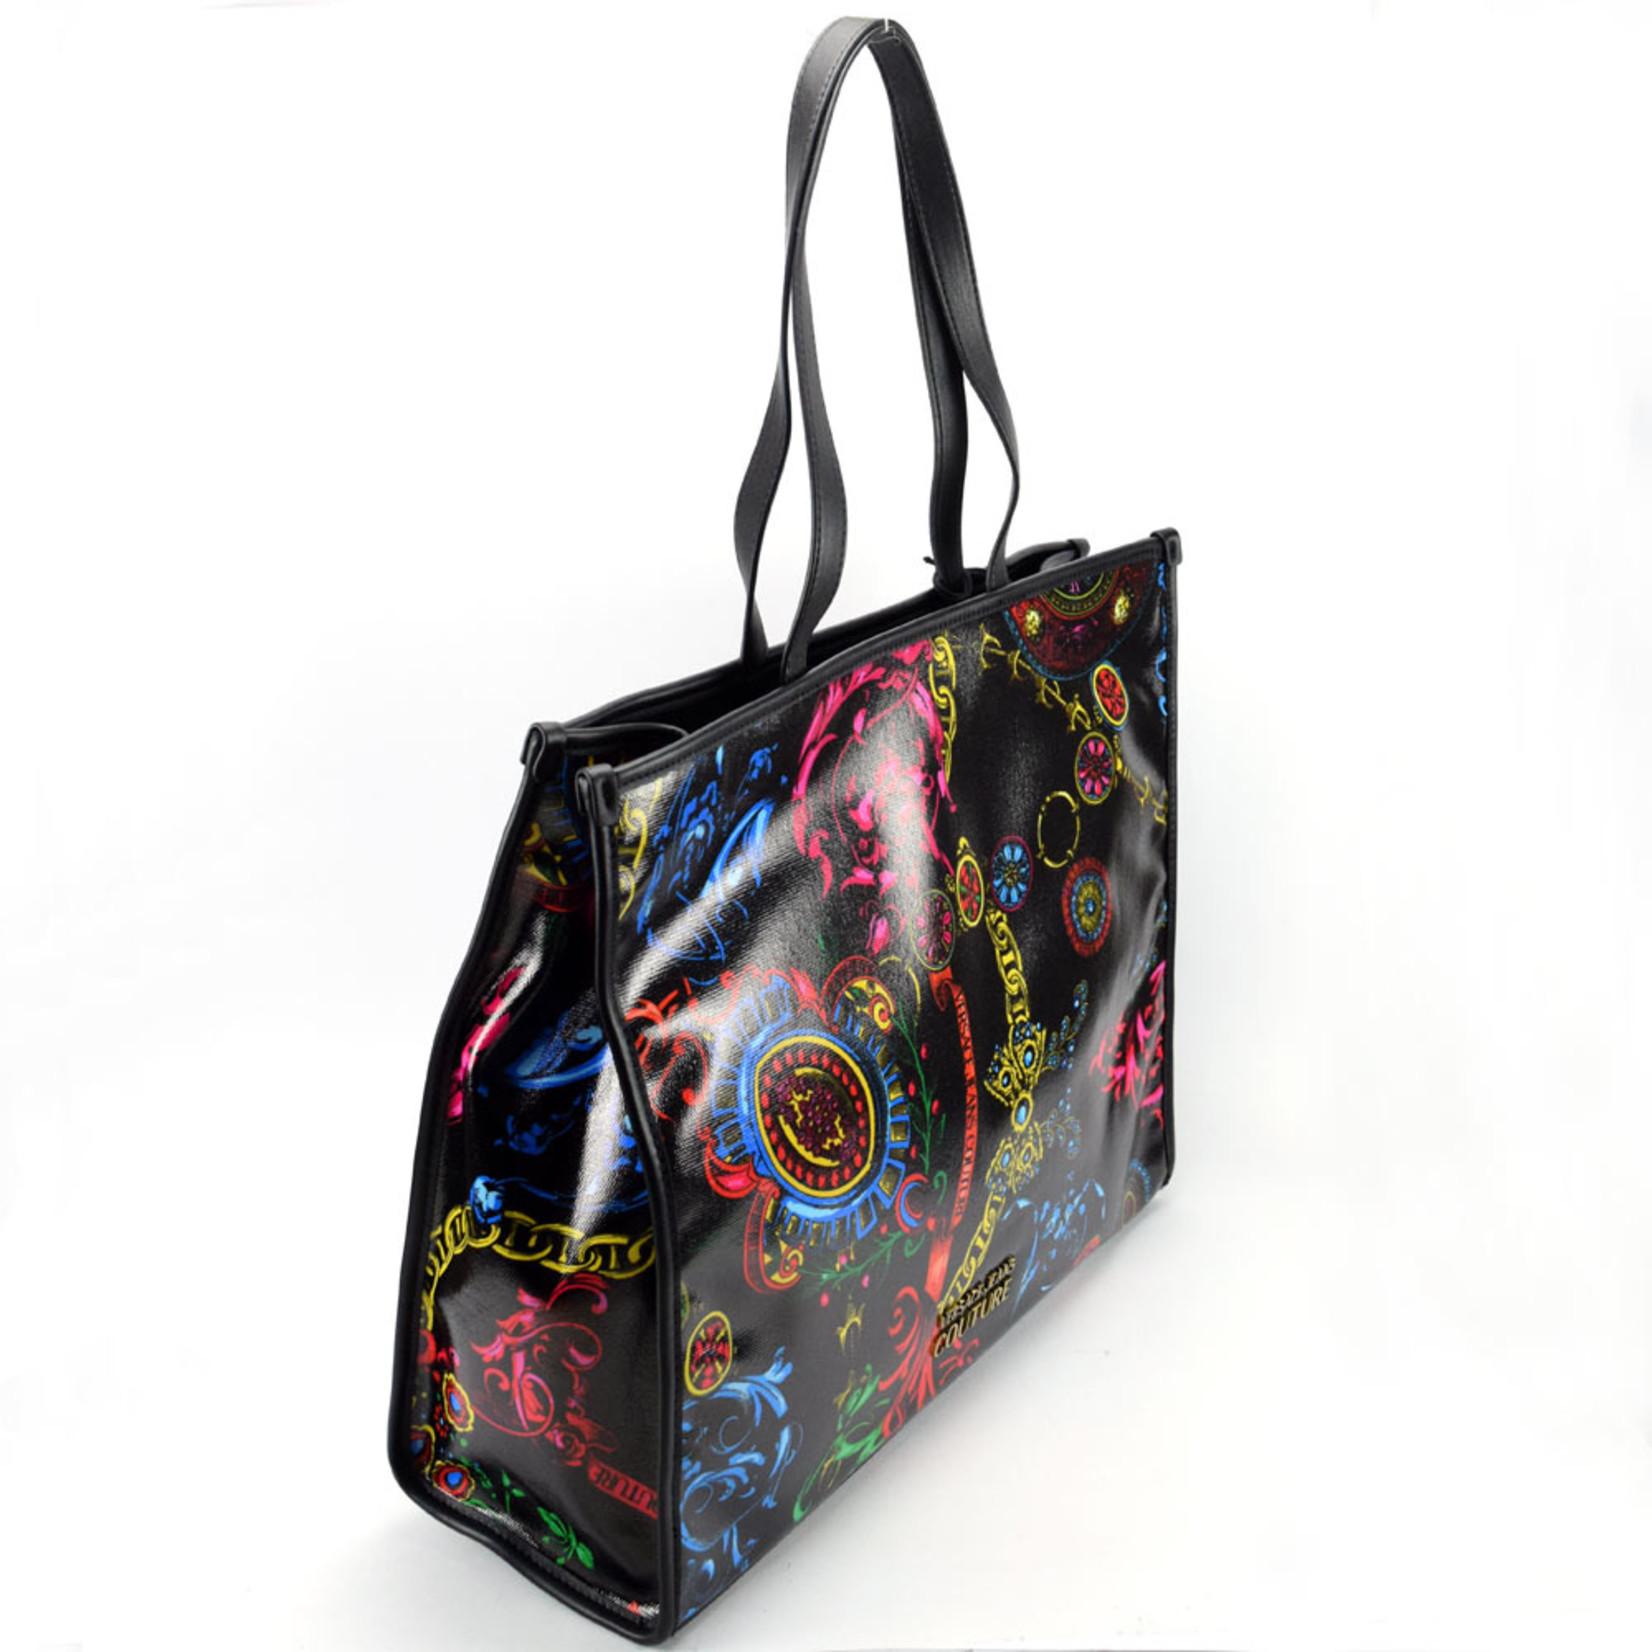 VERSACE JEANS COUTURE VERSACE JEANS COUTURE WOMEN'S BAG RANGE W CANCAS TOTE - 71VA4BW1